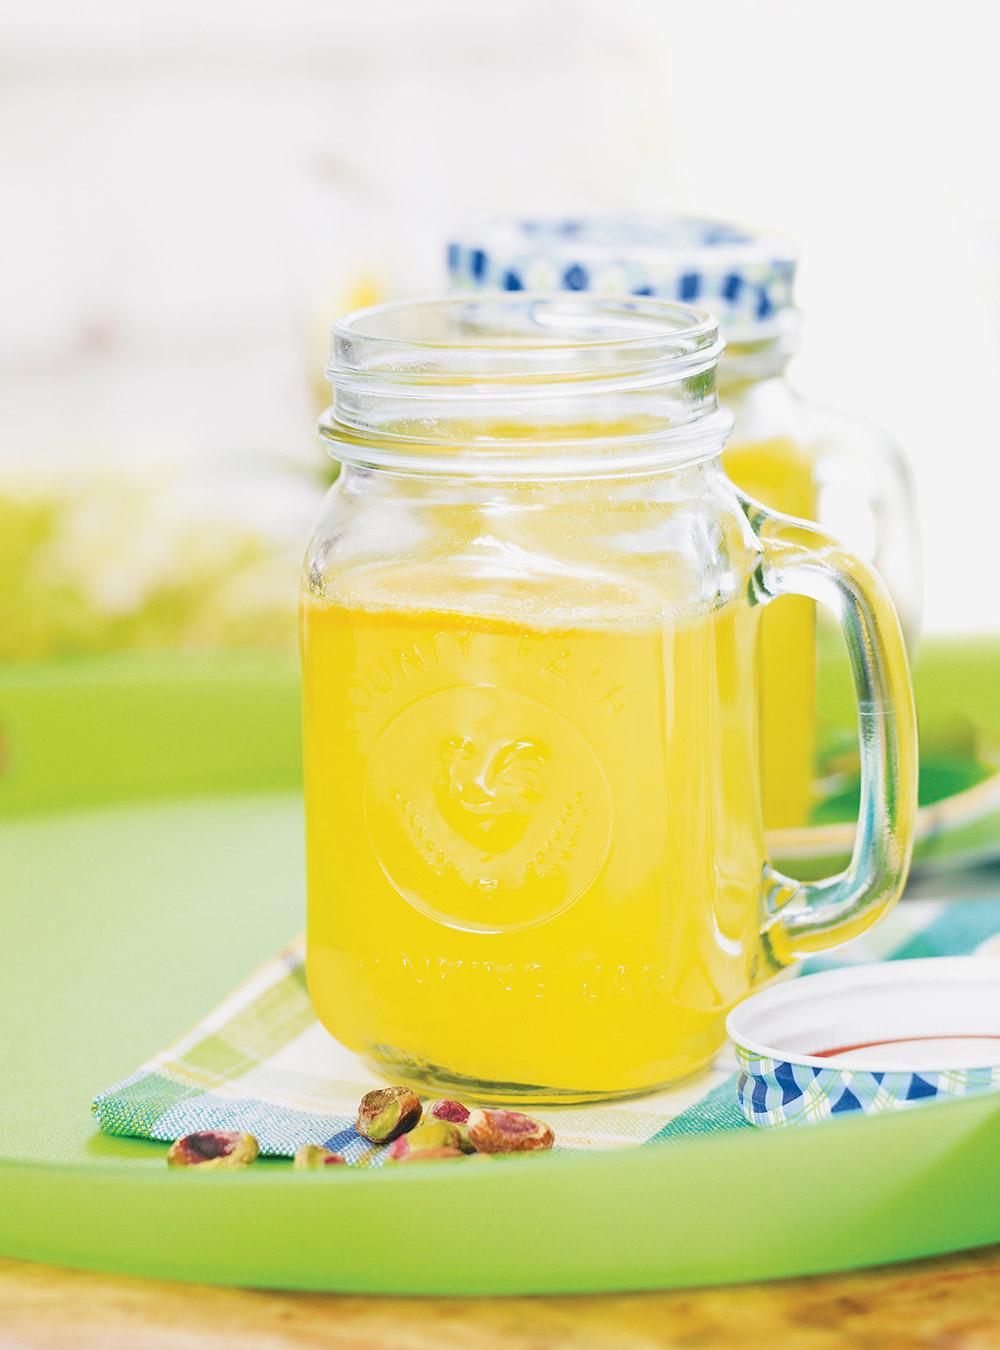 Orangette (limonade à l'orange) | ricardo